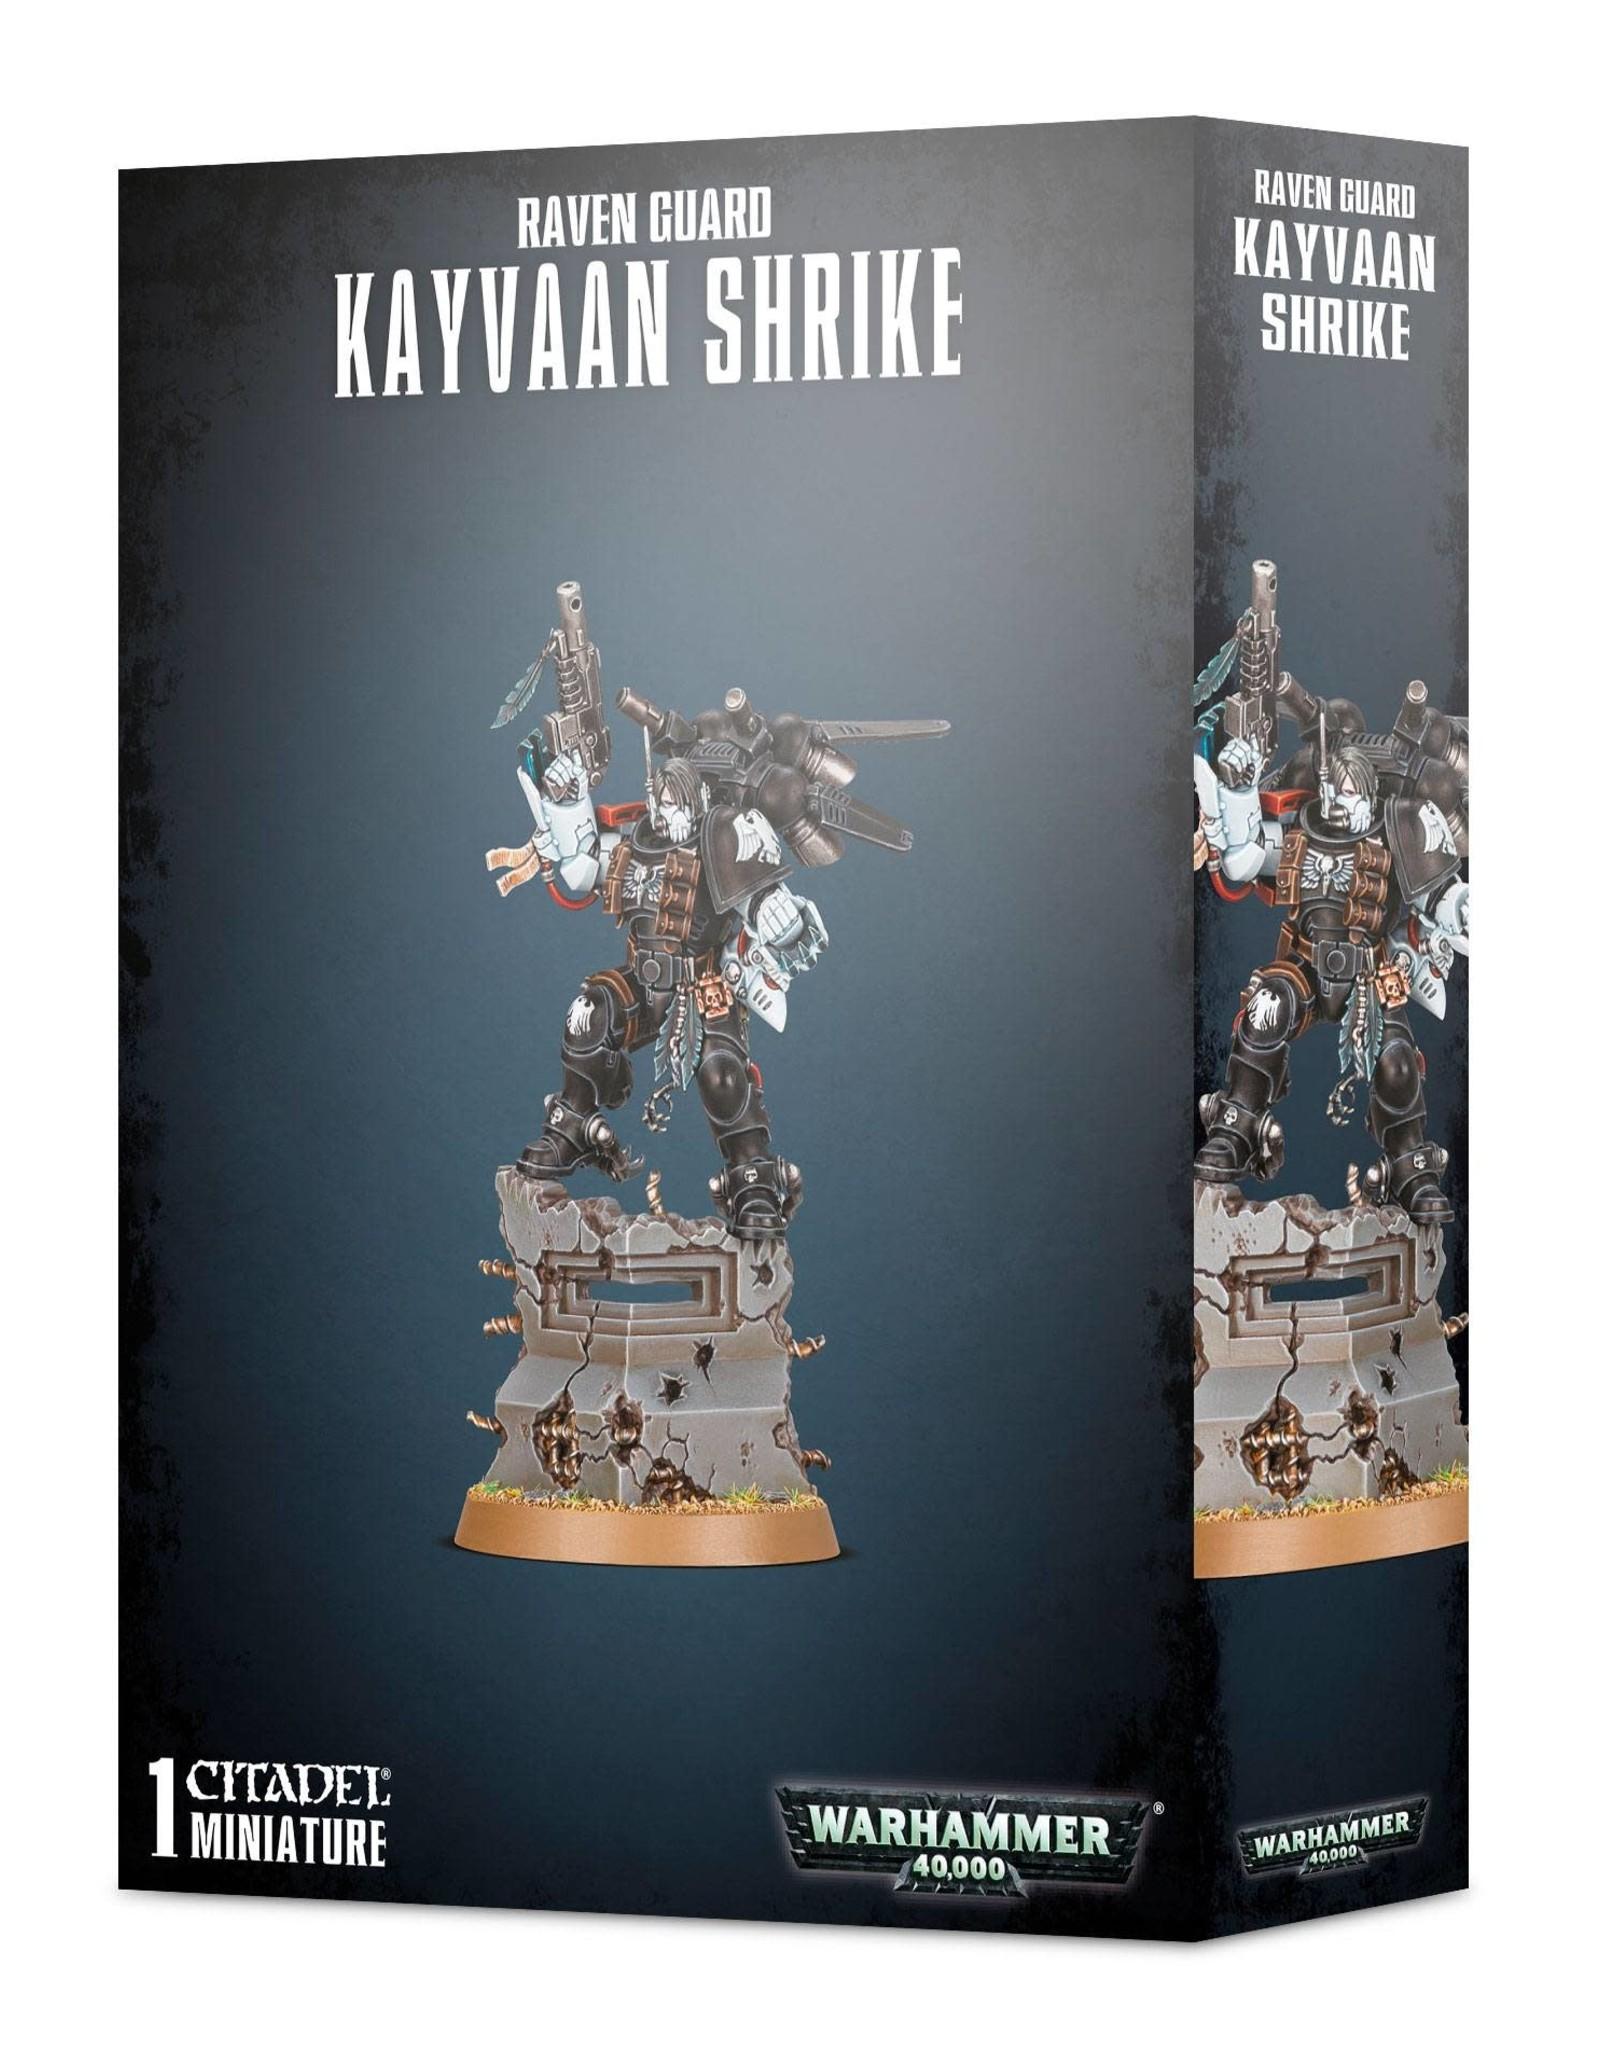 Warhammer 40K Raven Guard Kayvaan Shrike